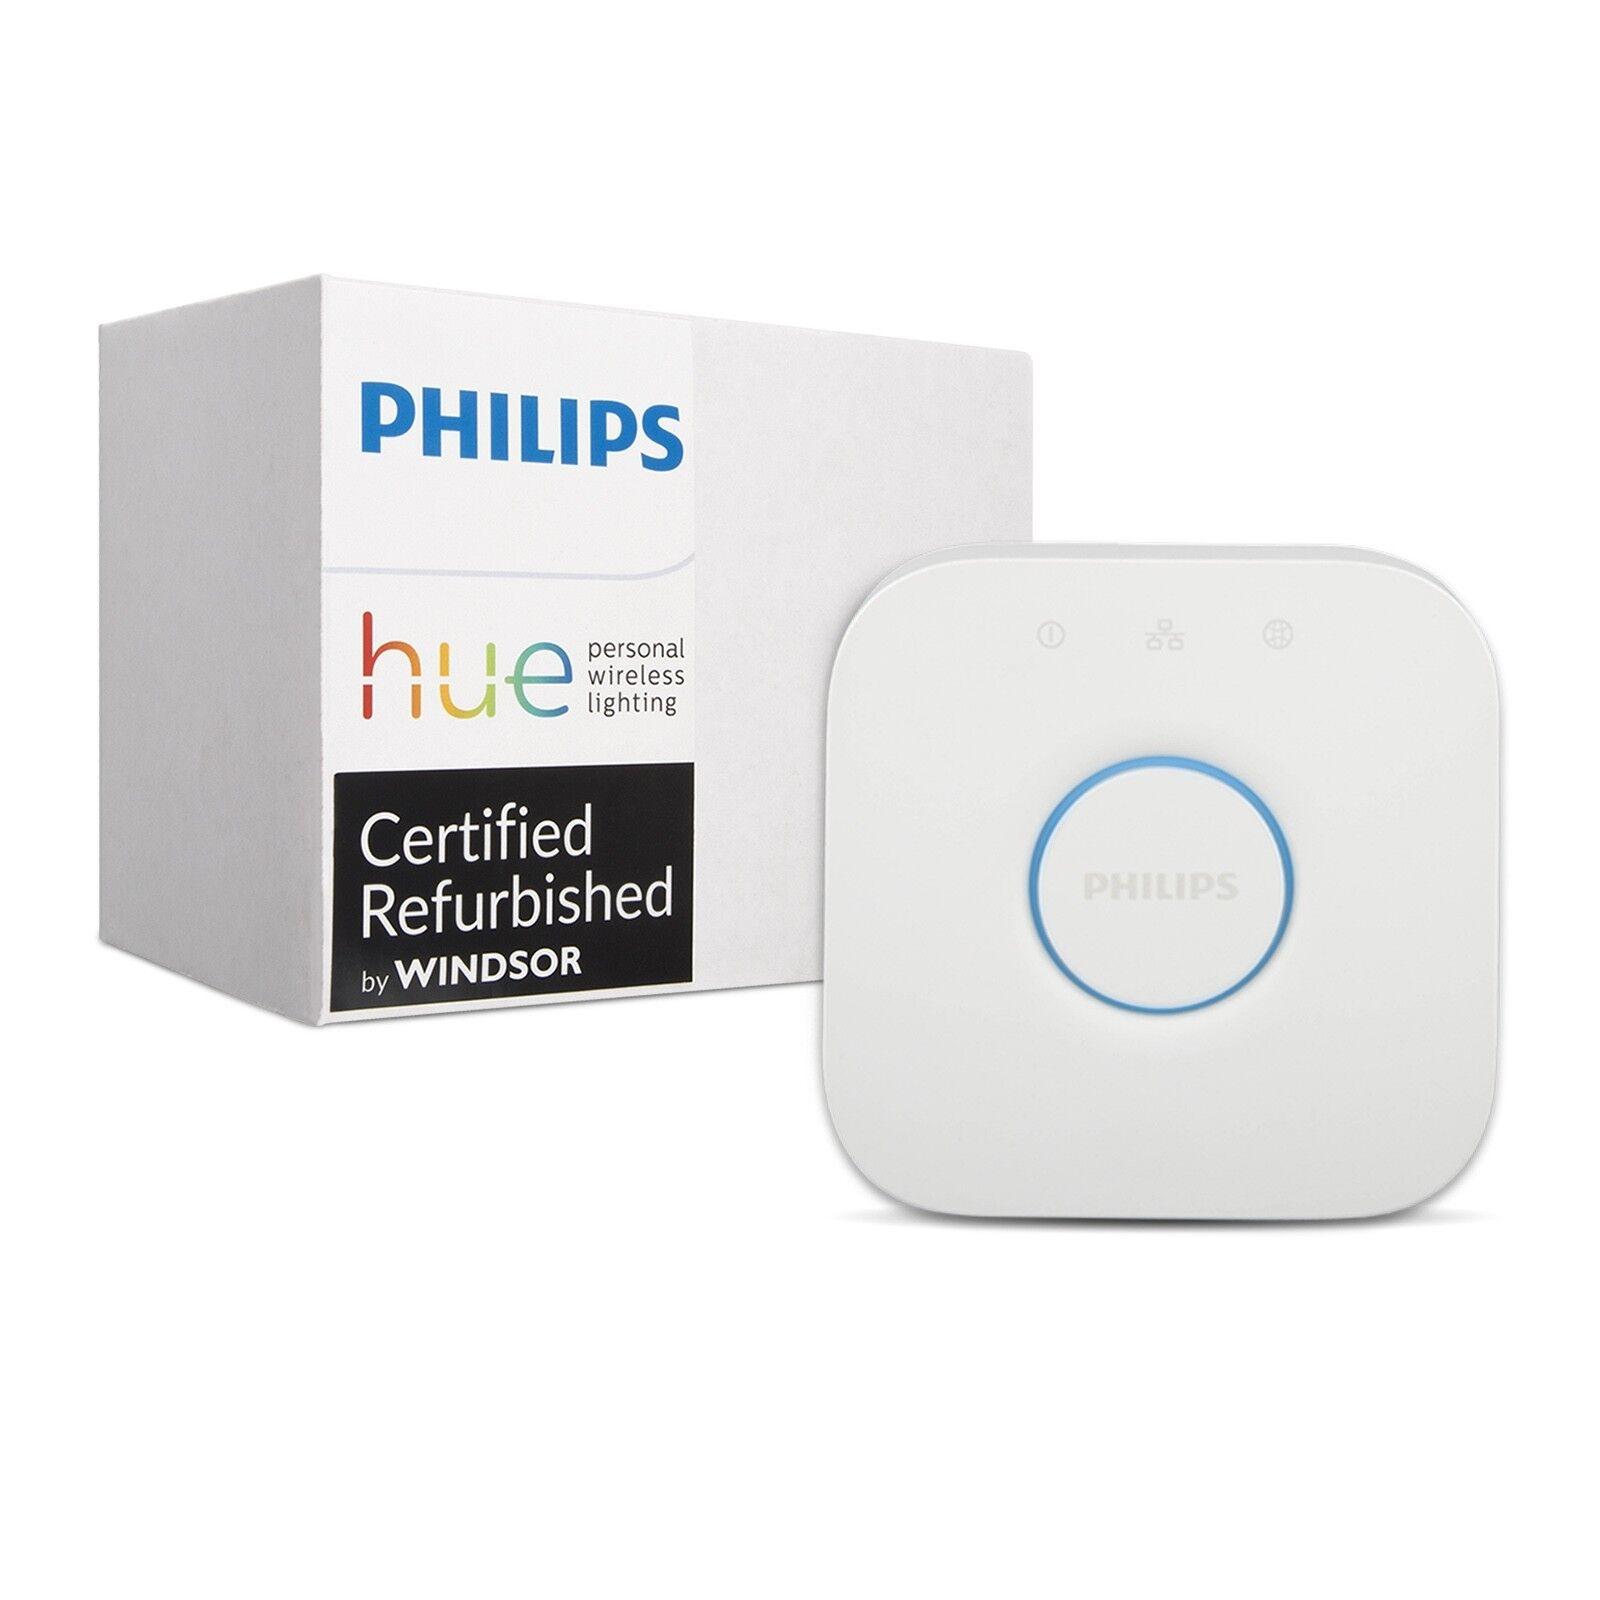 Philips Hue Bridge 2nd Generation Home Automation Kit 458471~~~NEW SEALED BOX